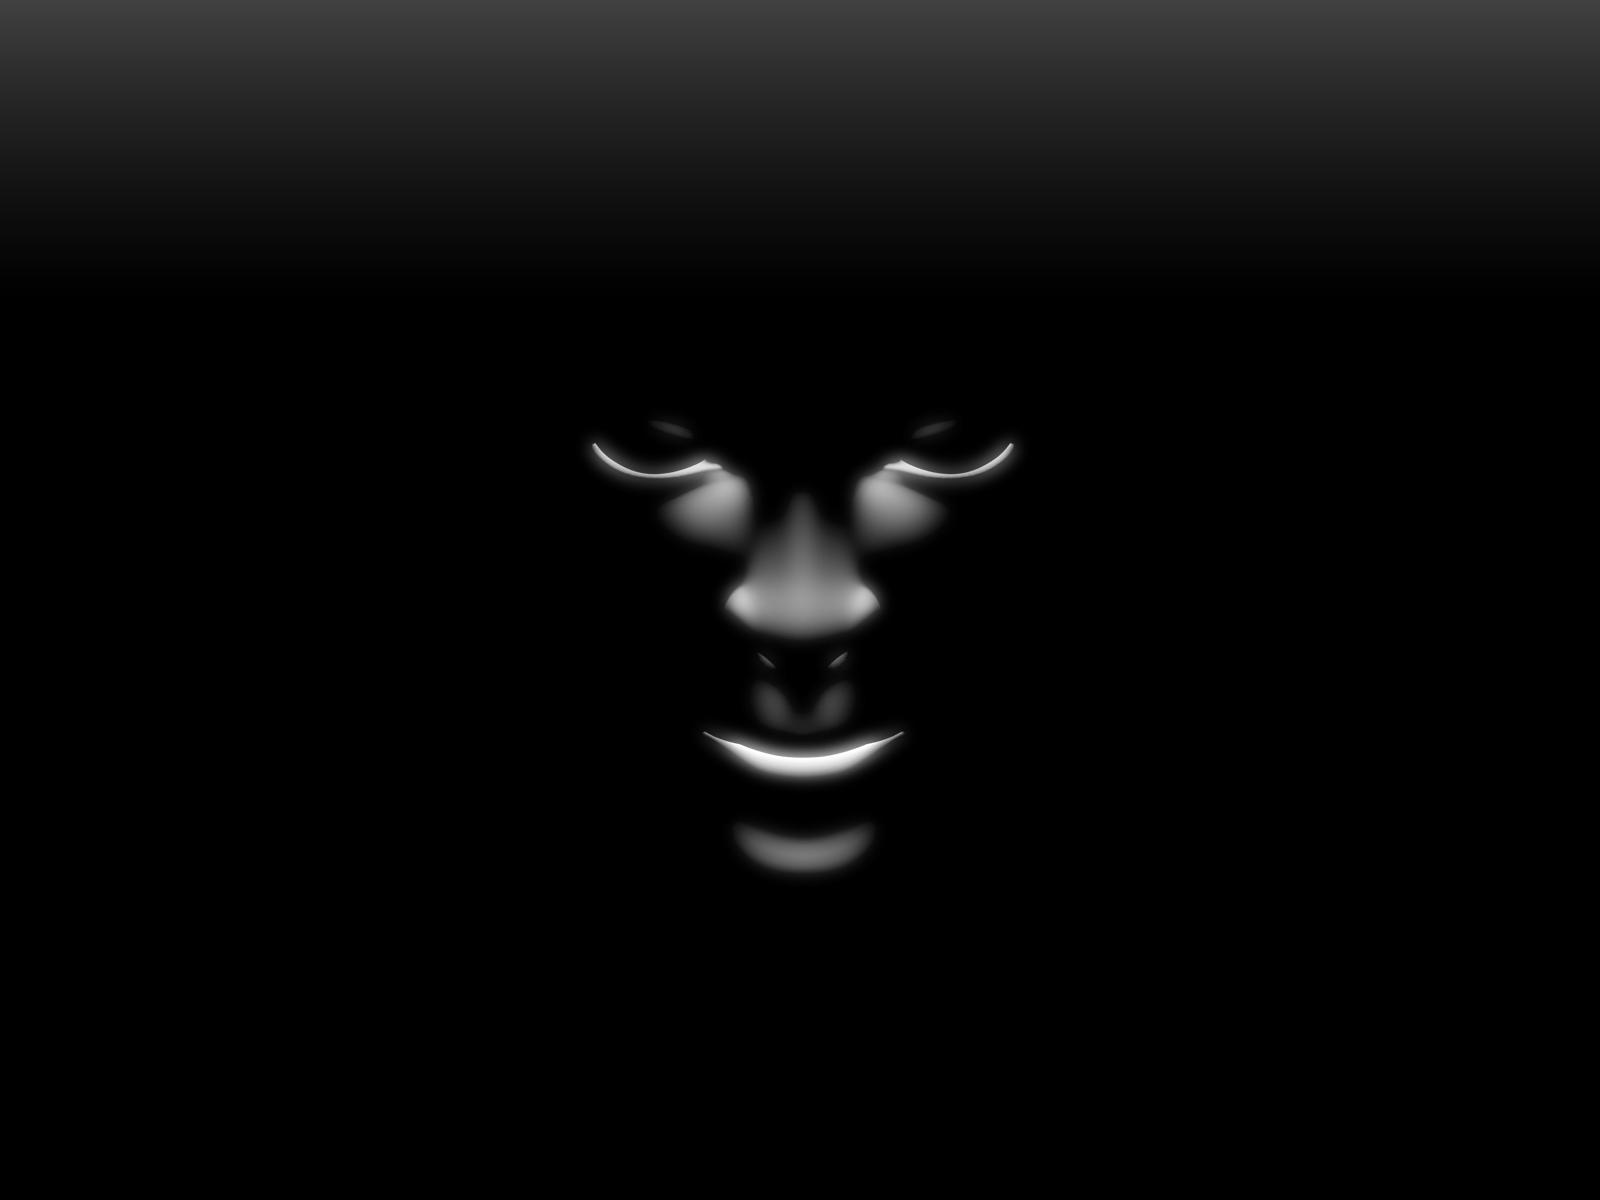 Black Shadow Face   Black Wallpaper 28305464 1600x1200